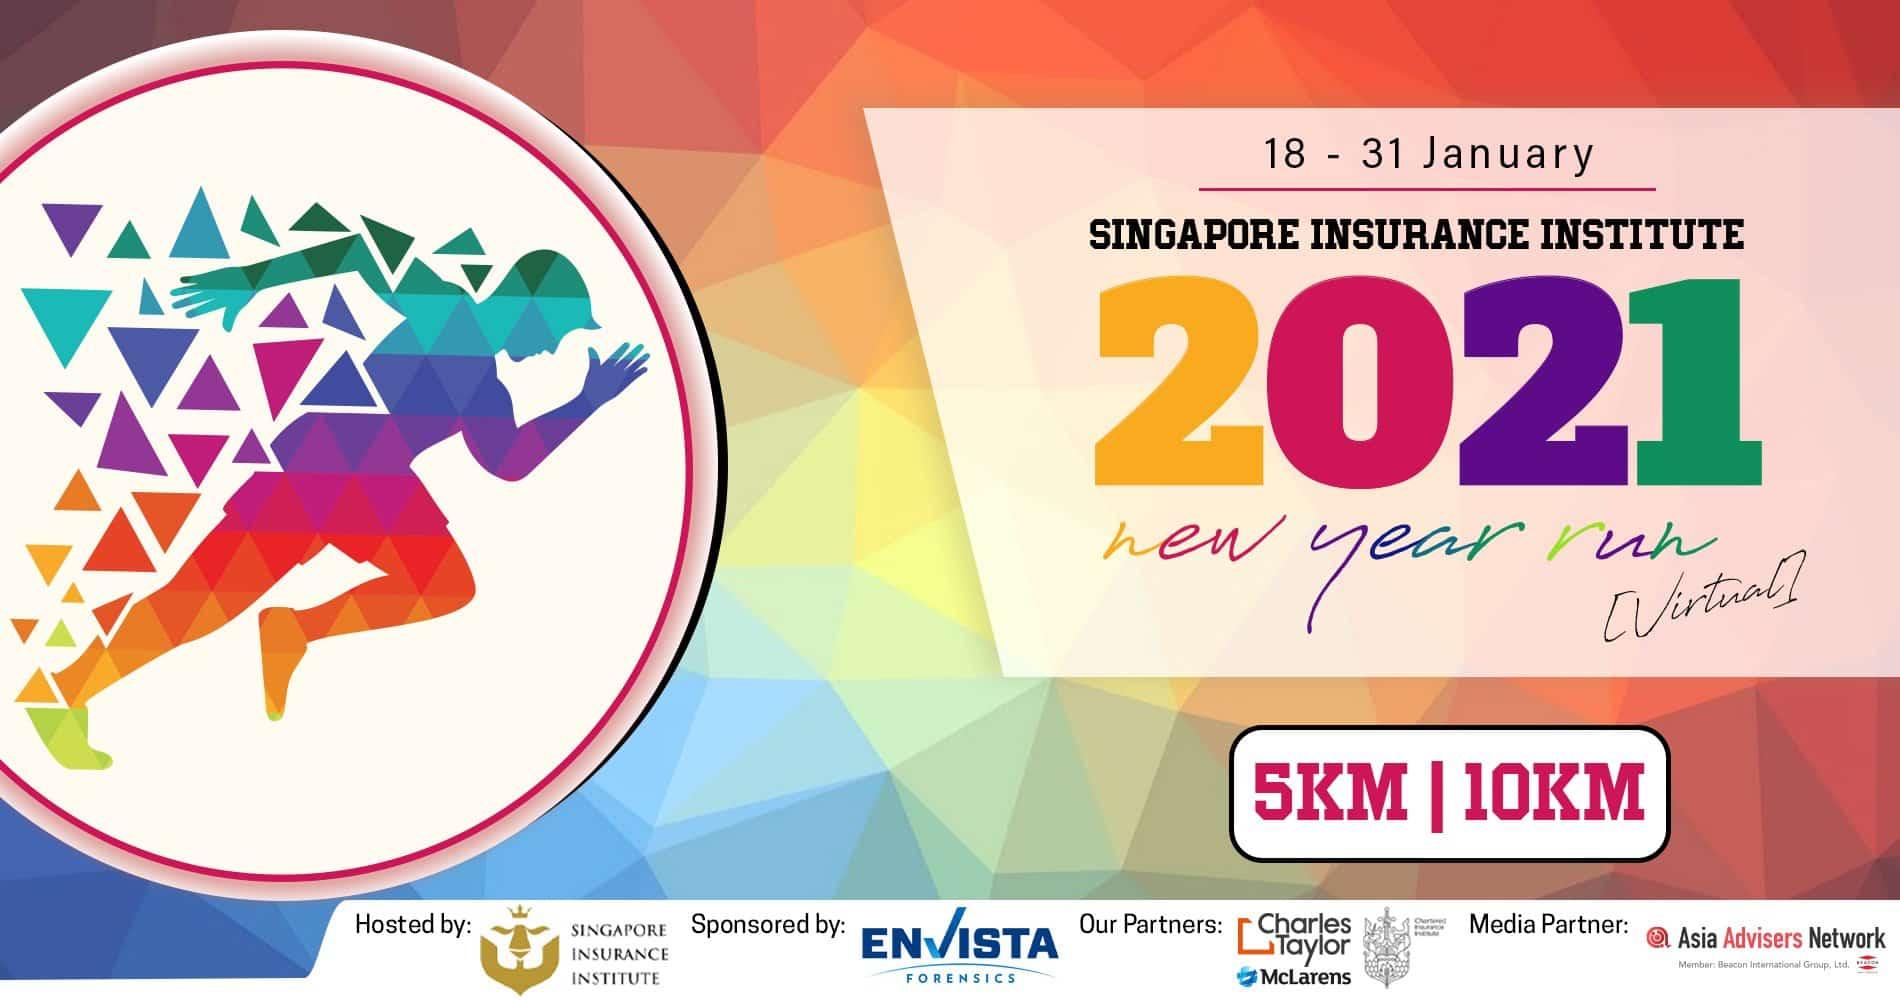 Singapore Insurance Institute Virtual Run 2021